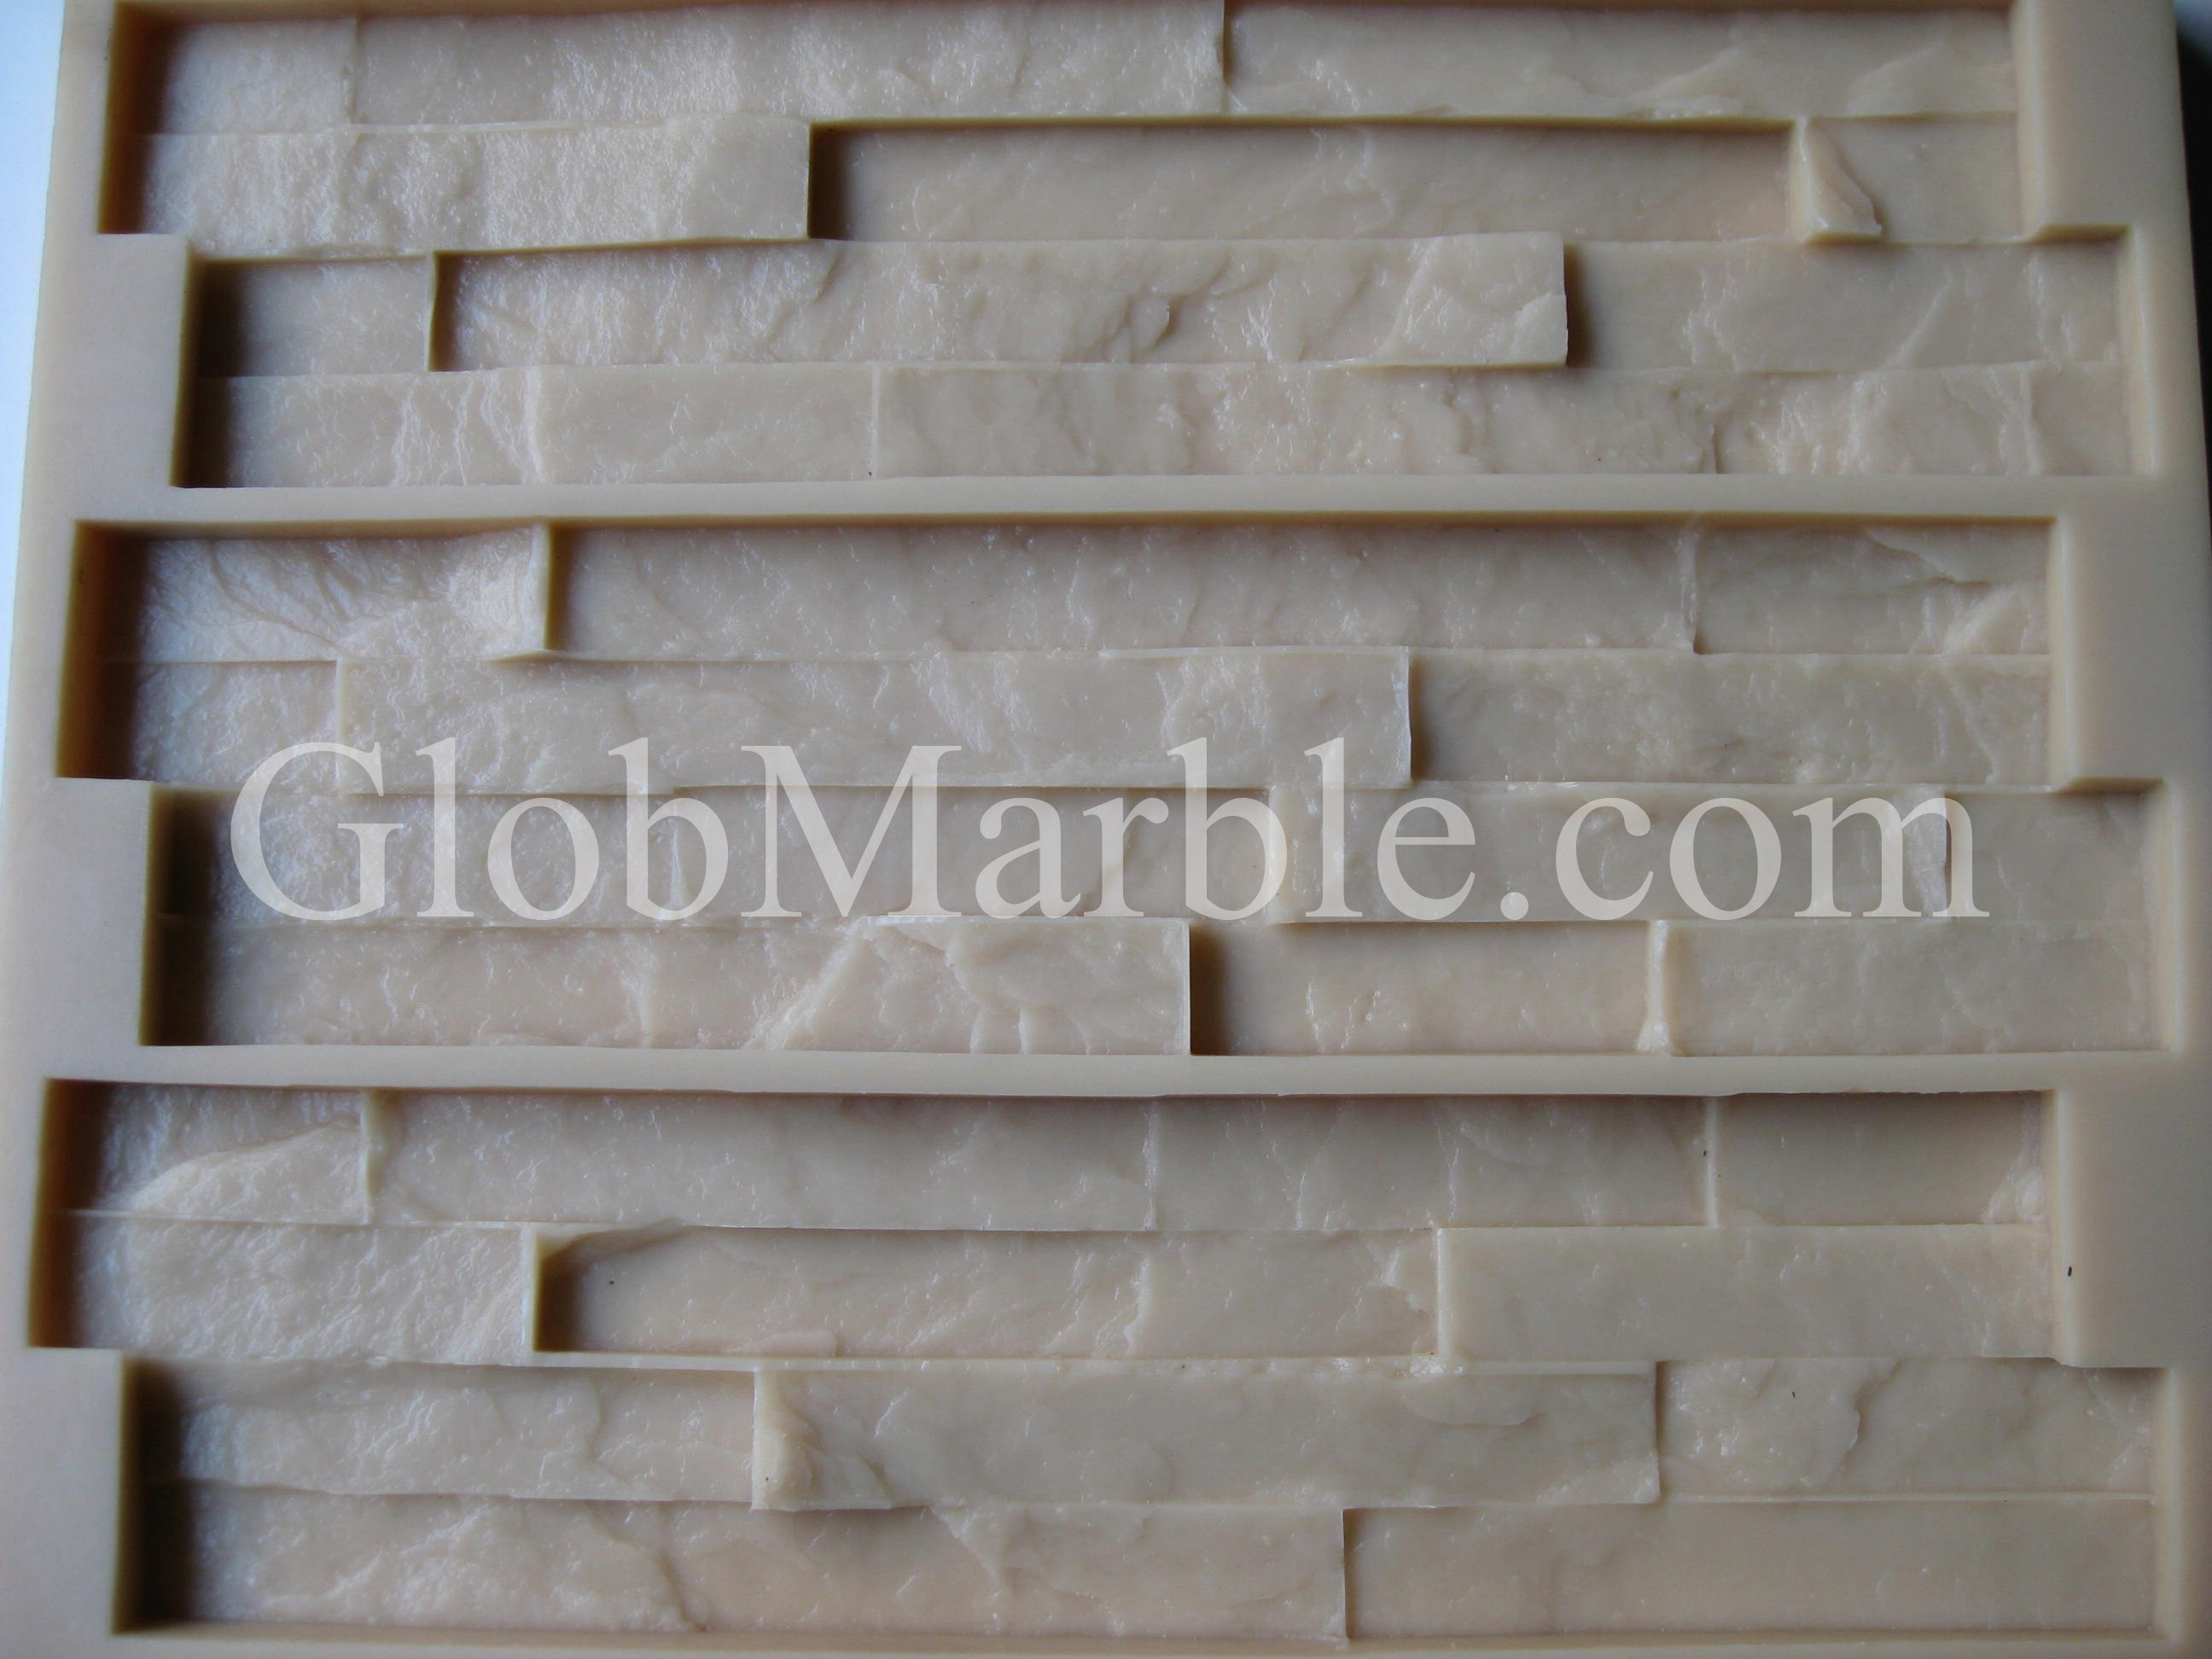 Globmarble LLC